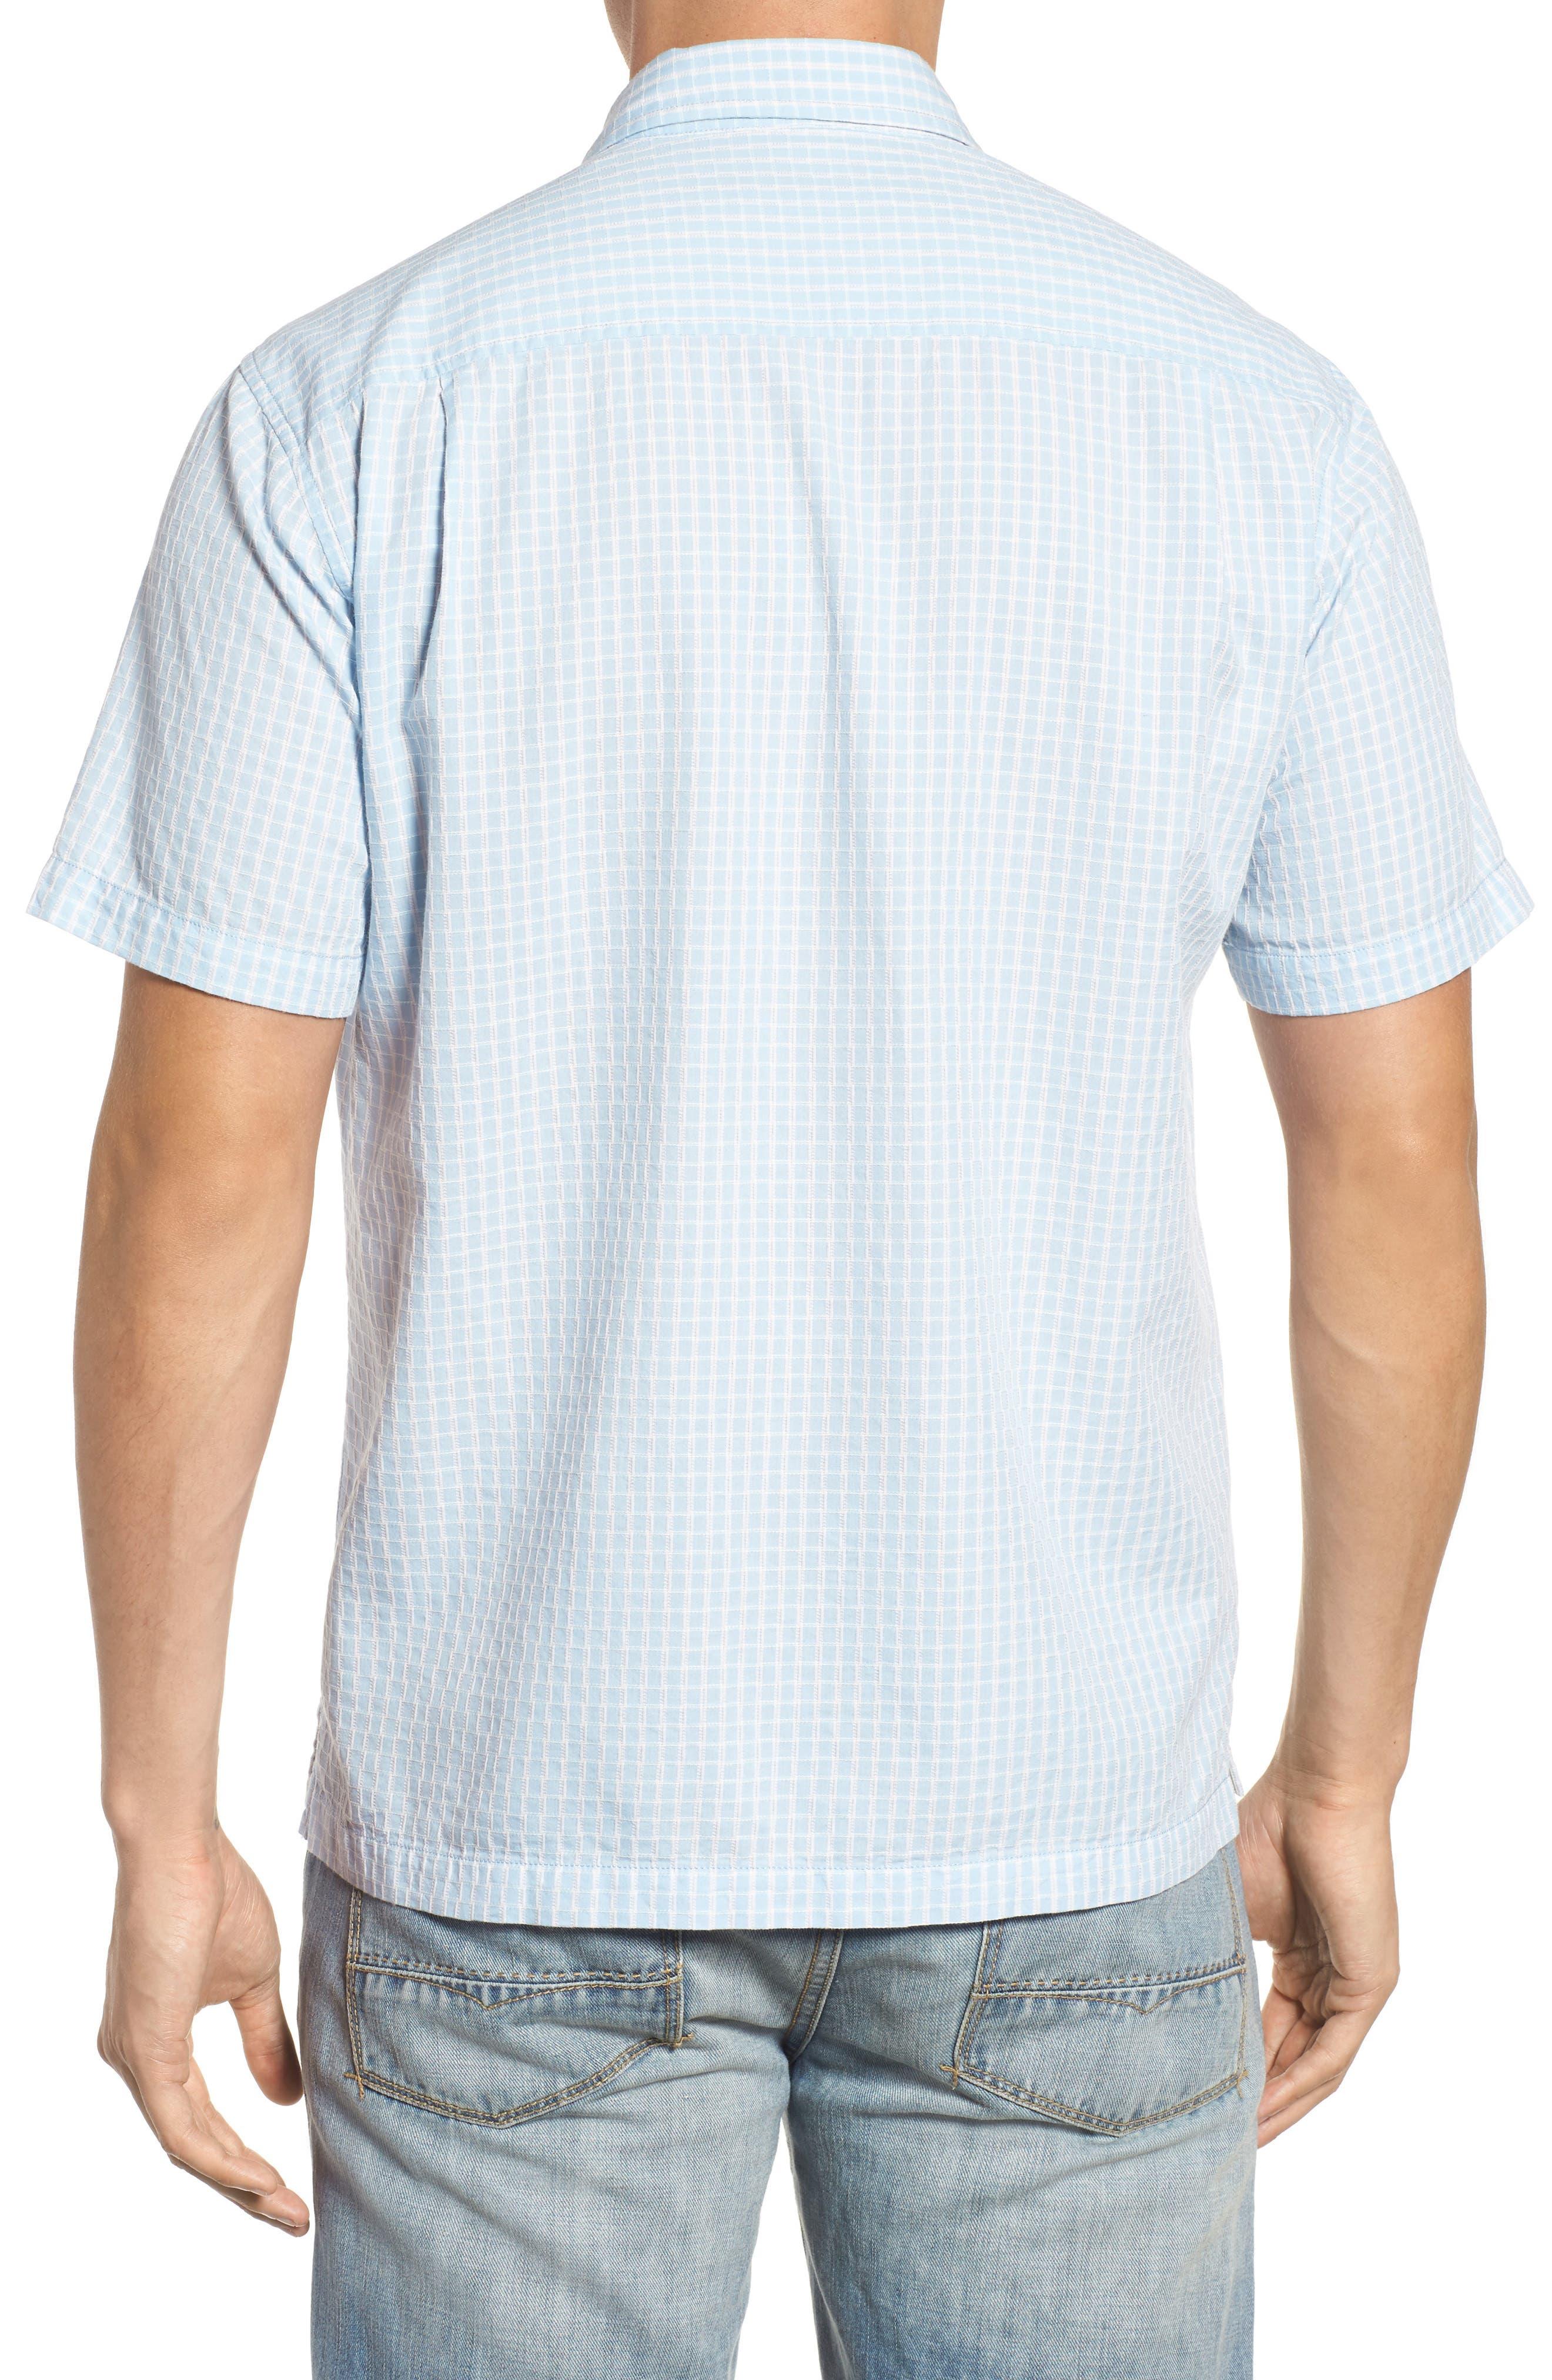 Once in a Tile Regular Fit Sport Shirt,                             Alternate thumbnail 2, color,                             Opal